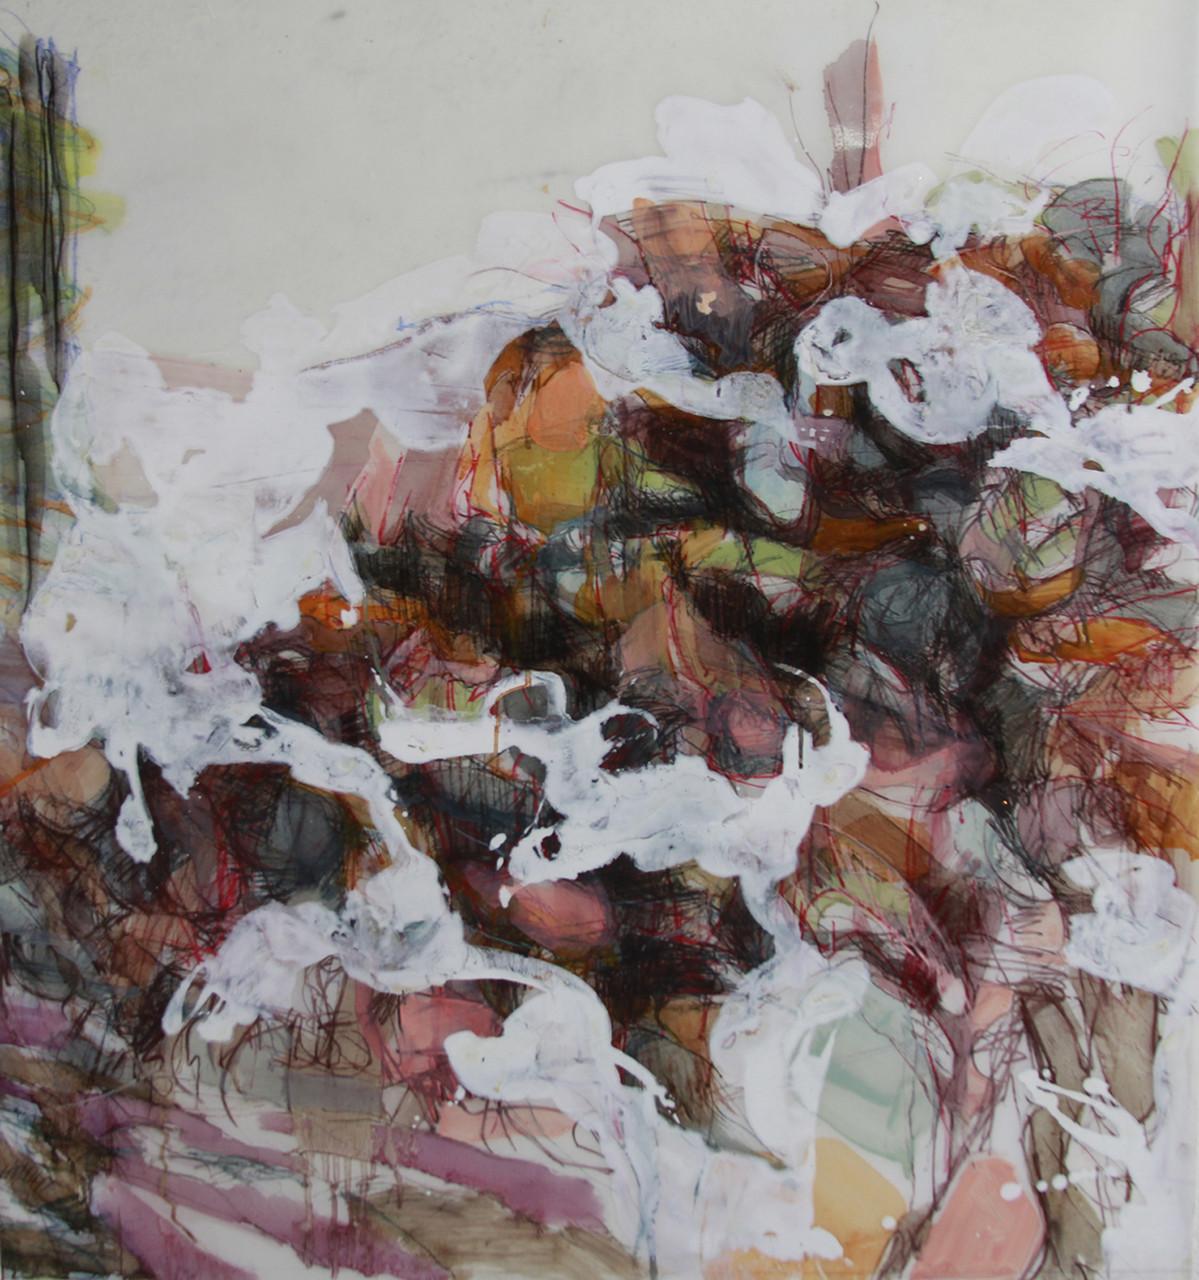 Fluid Obscure , 2014 Charcoal, oil pastel, and enamel on mylar 30 x 32 in.